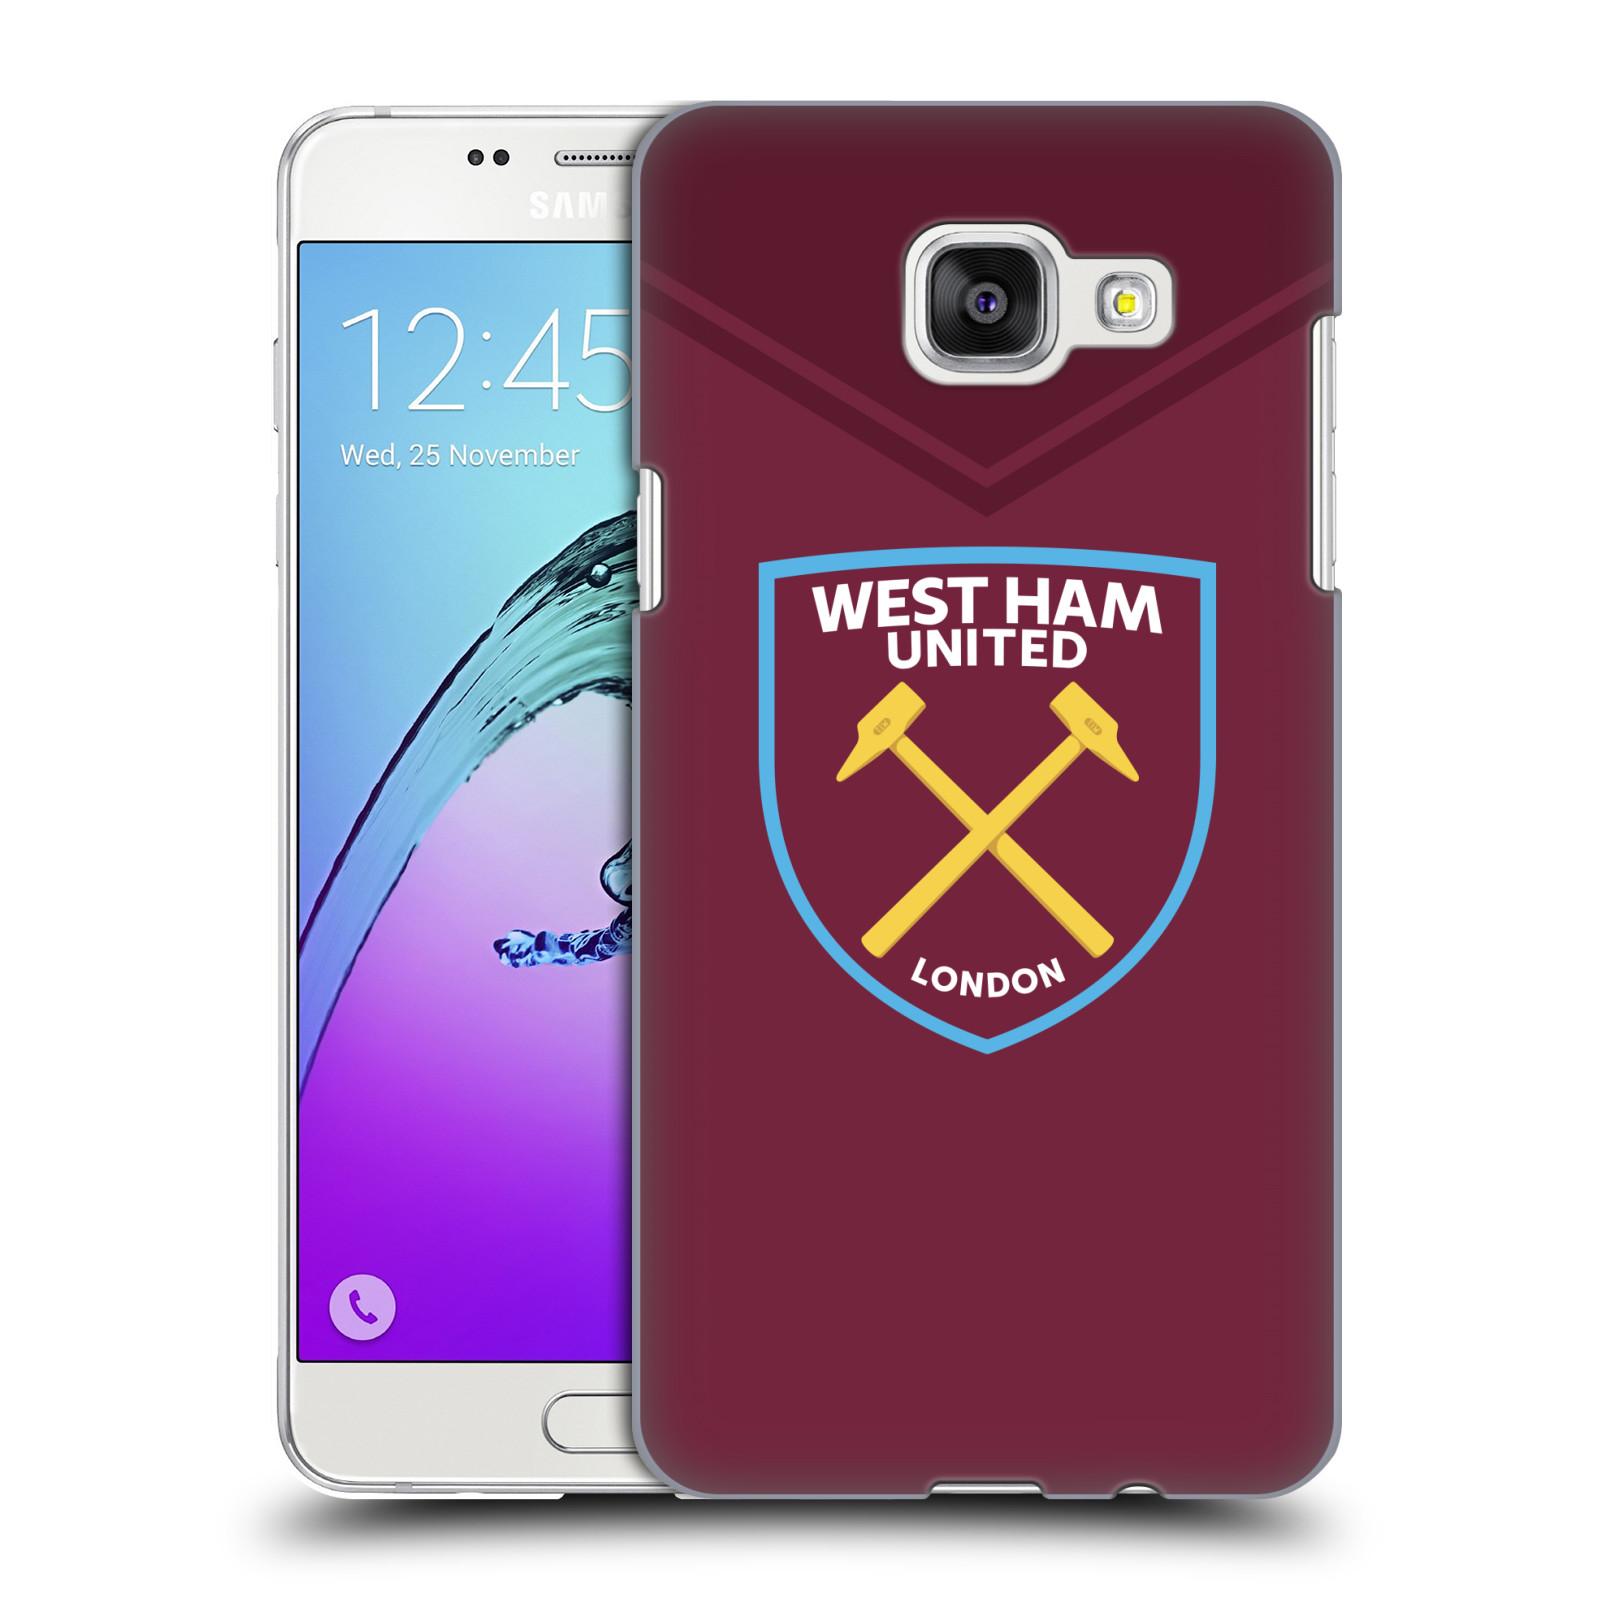 Plastové pouzdro na mobil Samsung Galaxy A5 (2016) - Head Case - West Ham United - Logo